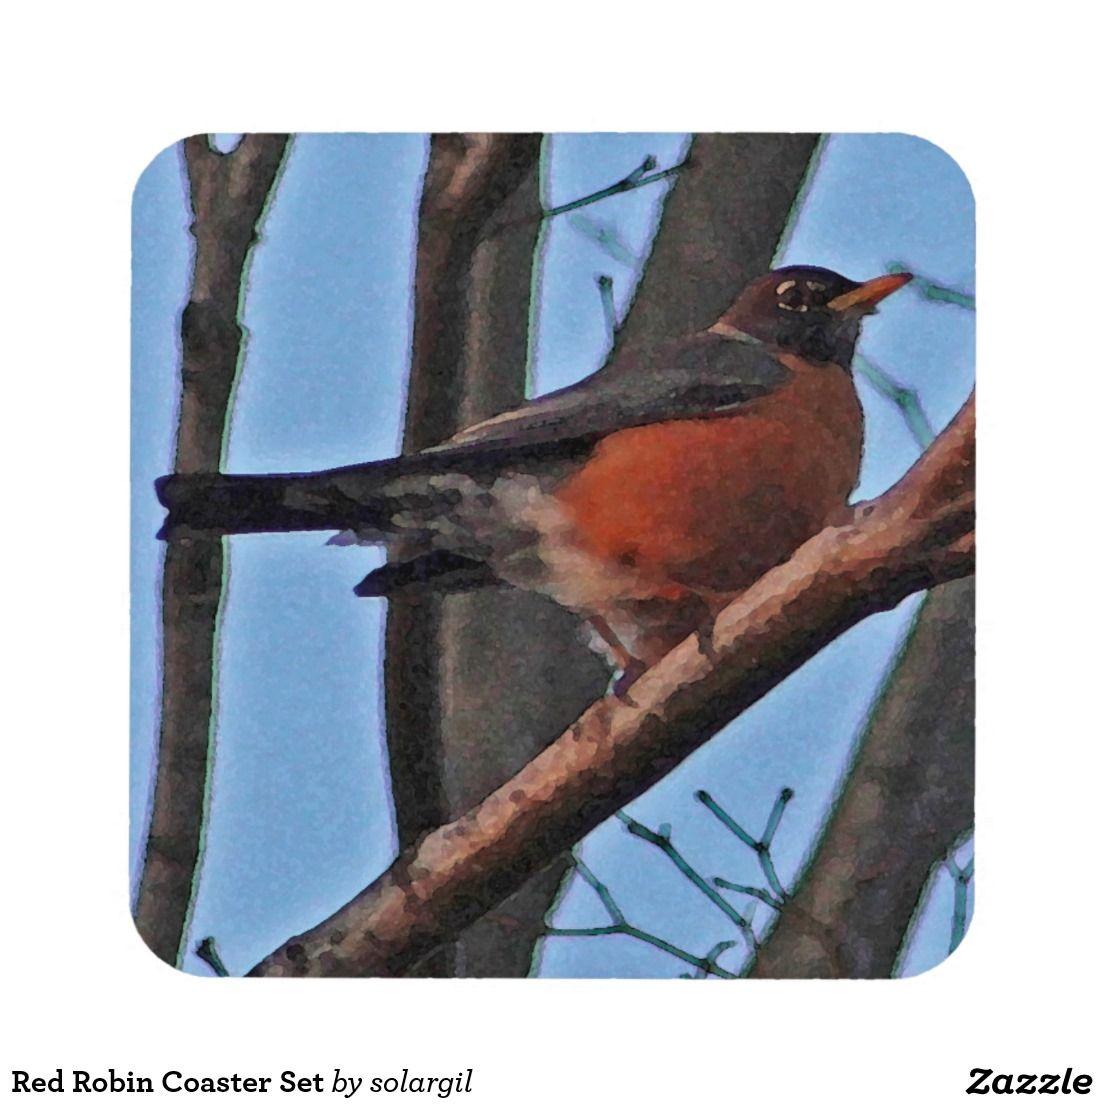 Red Robin Coaster Set